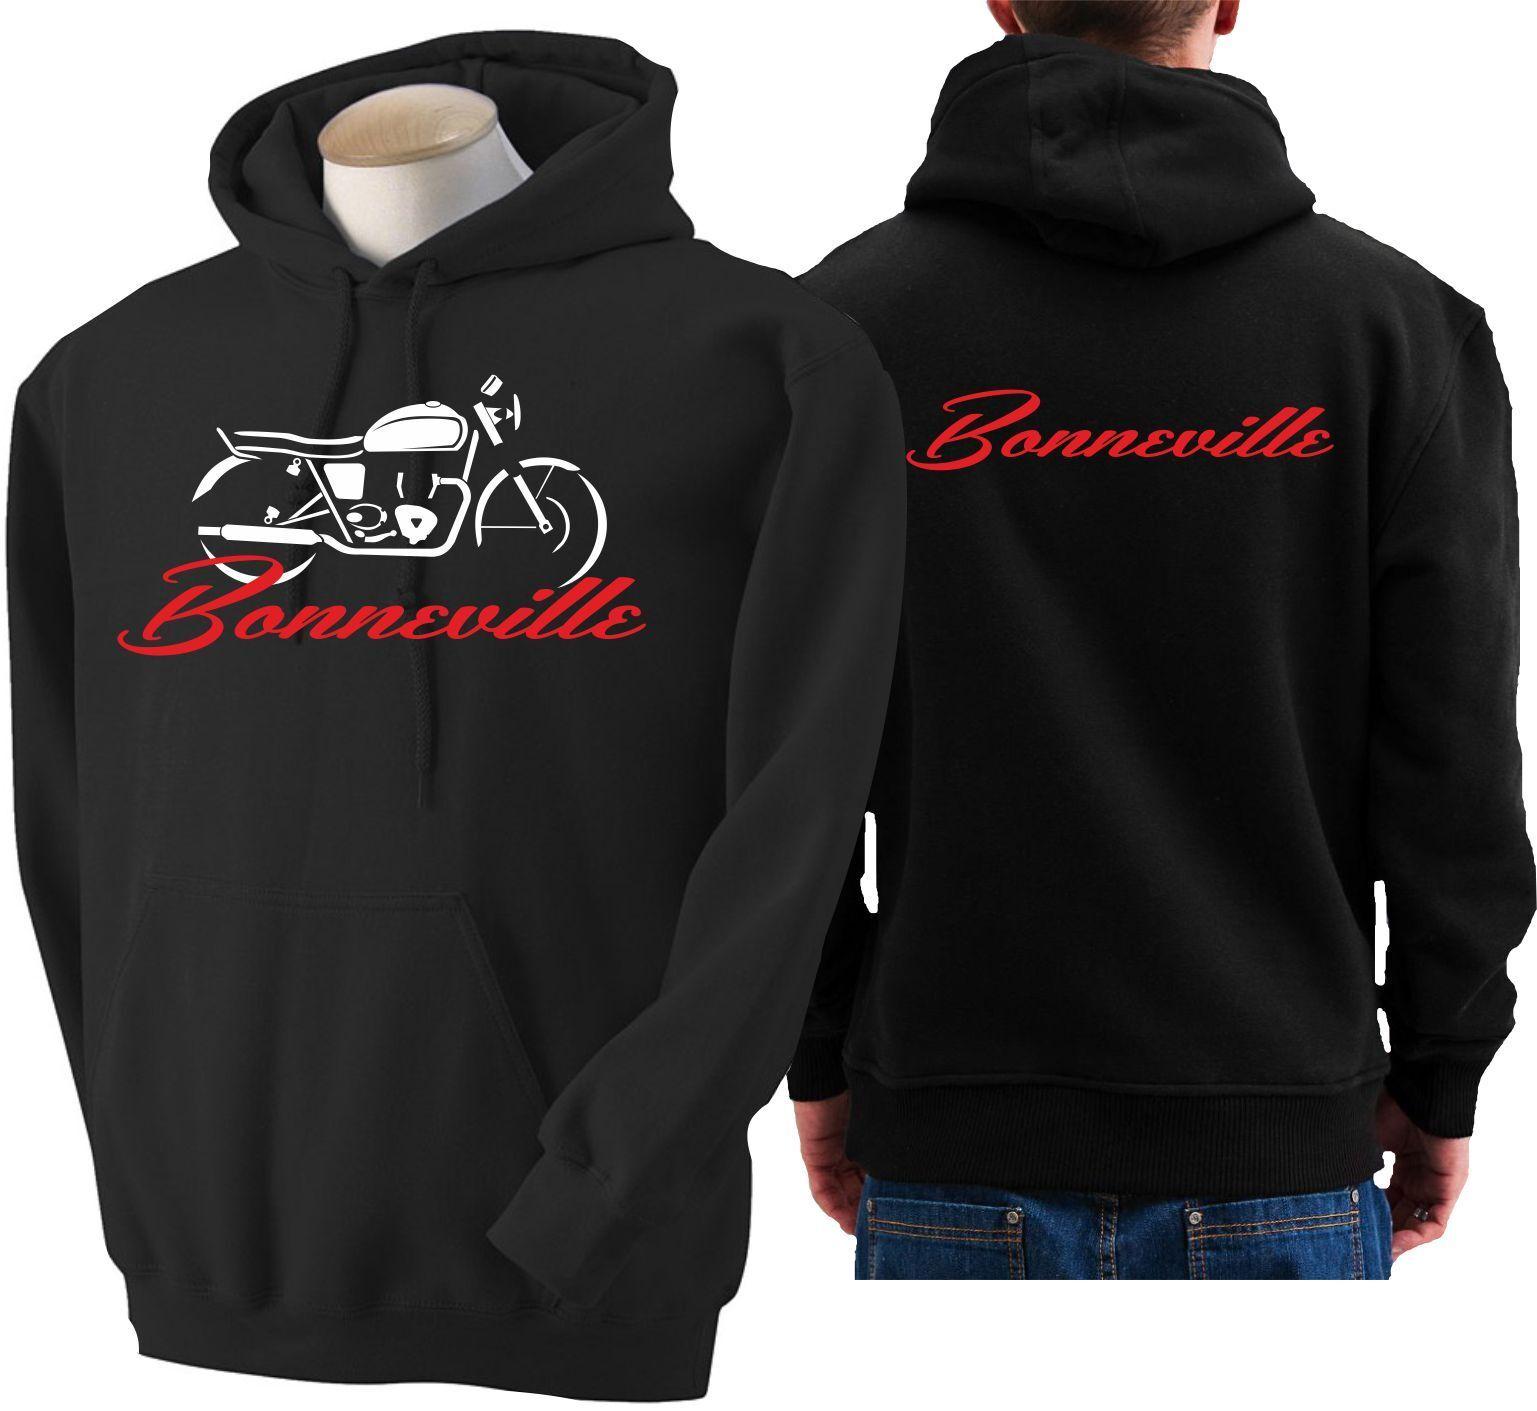 Hoodie for bike TRIUMPH Bonneville sweatshirt hoody Sudadera moto sweater